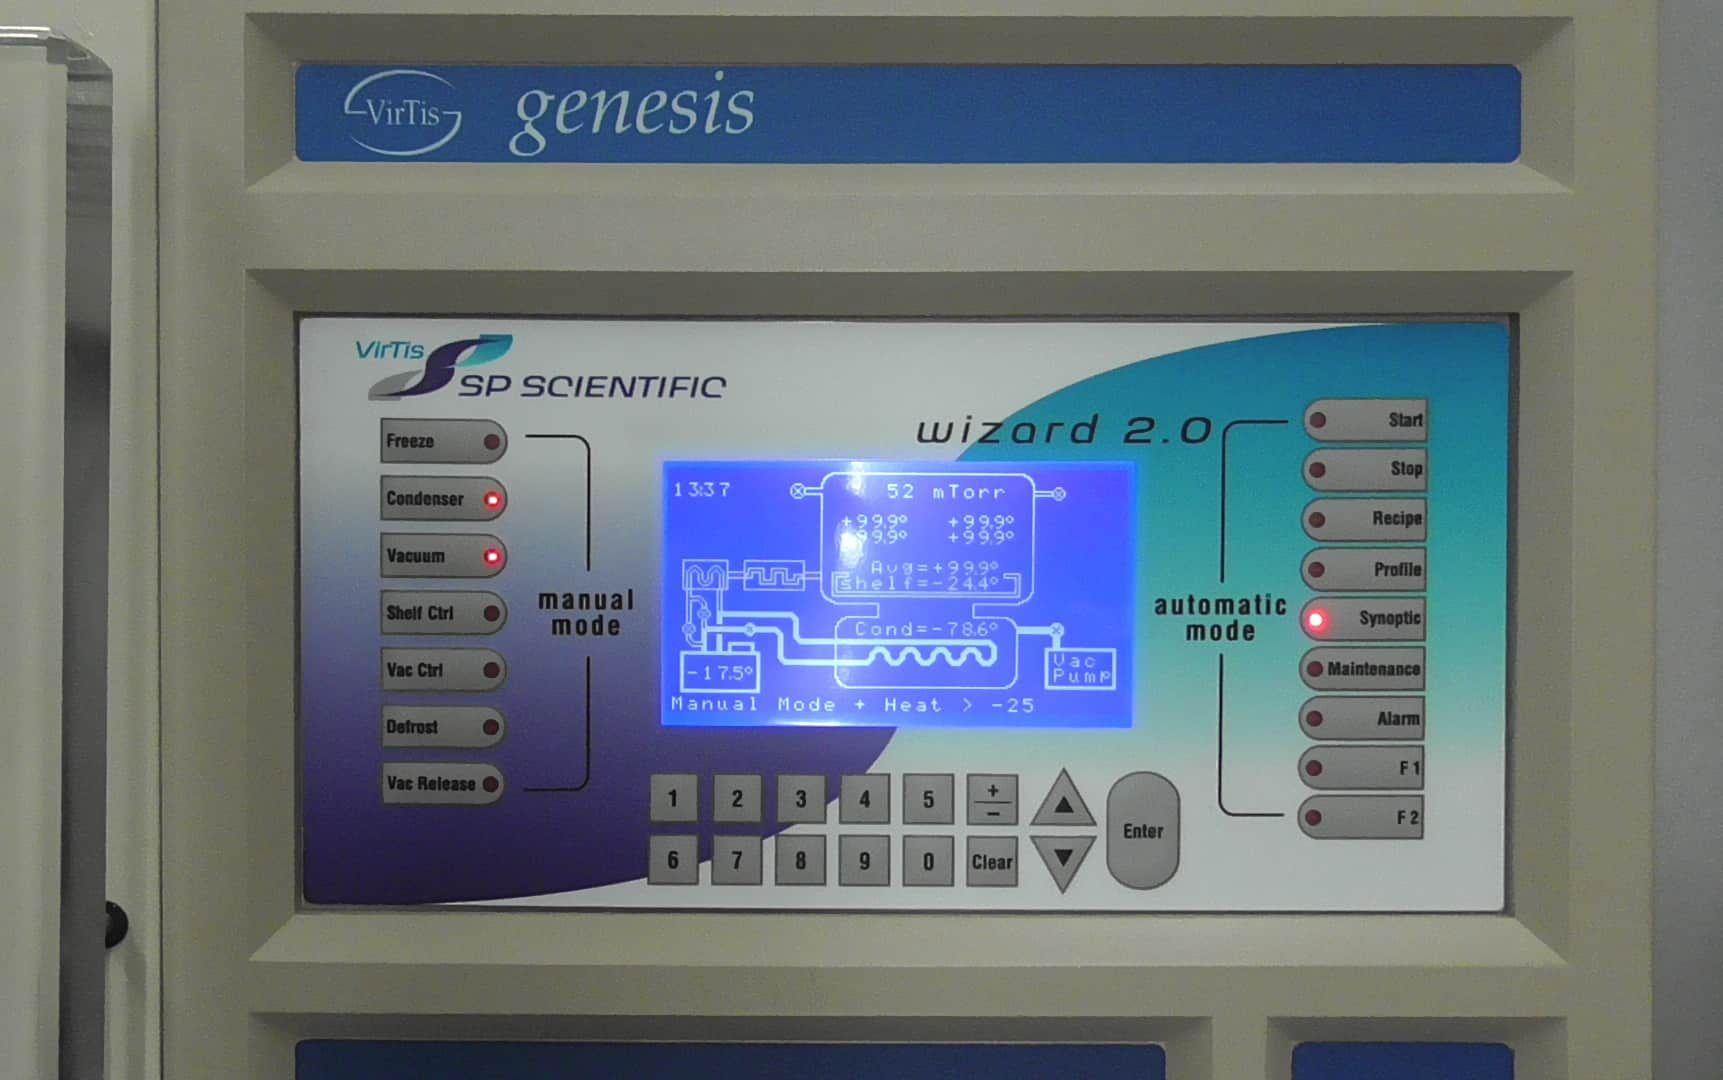 Virtis 25L Genesis SQ EL -85 Lyophilizer (Part # 446590)